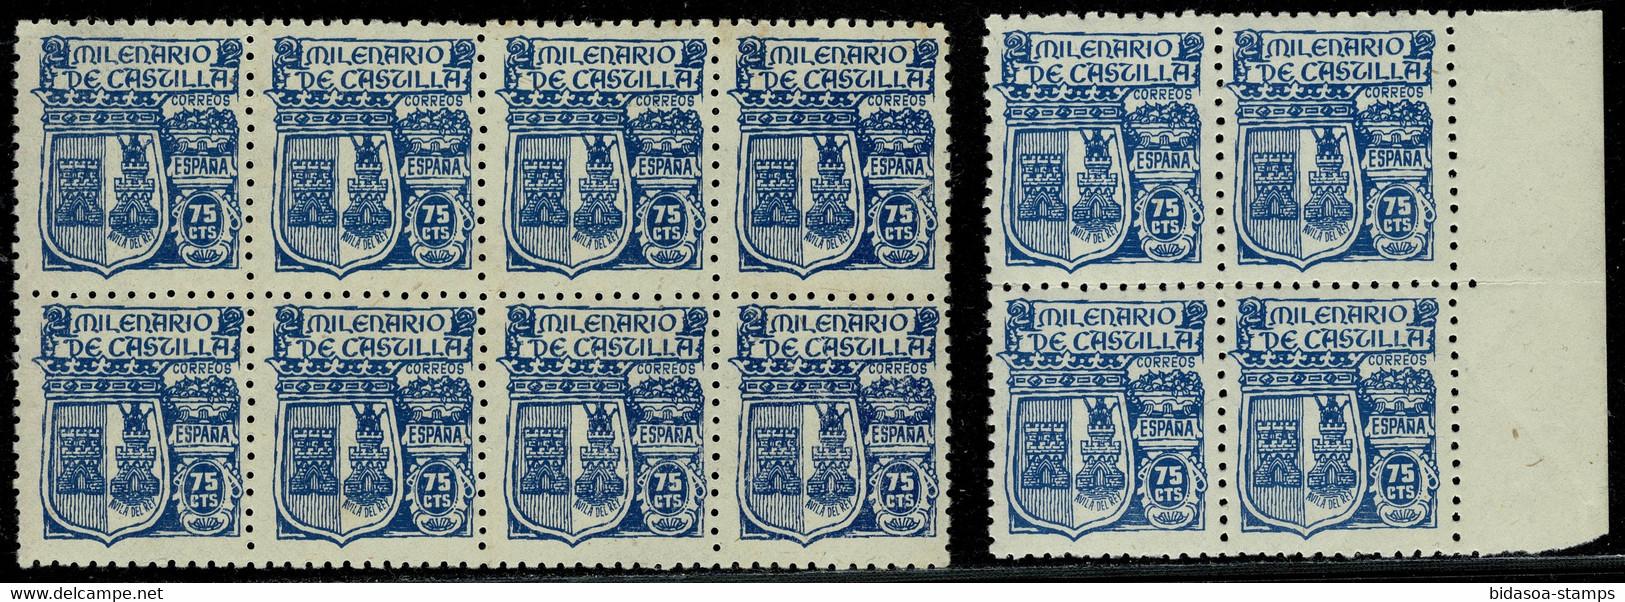 1944.MNH.Ed:**976(12).Milenario De Castilla.75 Cts Azul.2 Bloques Con 12 Sellos En Total.Regular Conservación - 1931-50 Ungebraucht